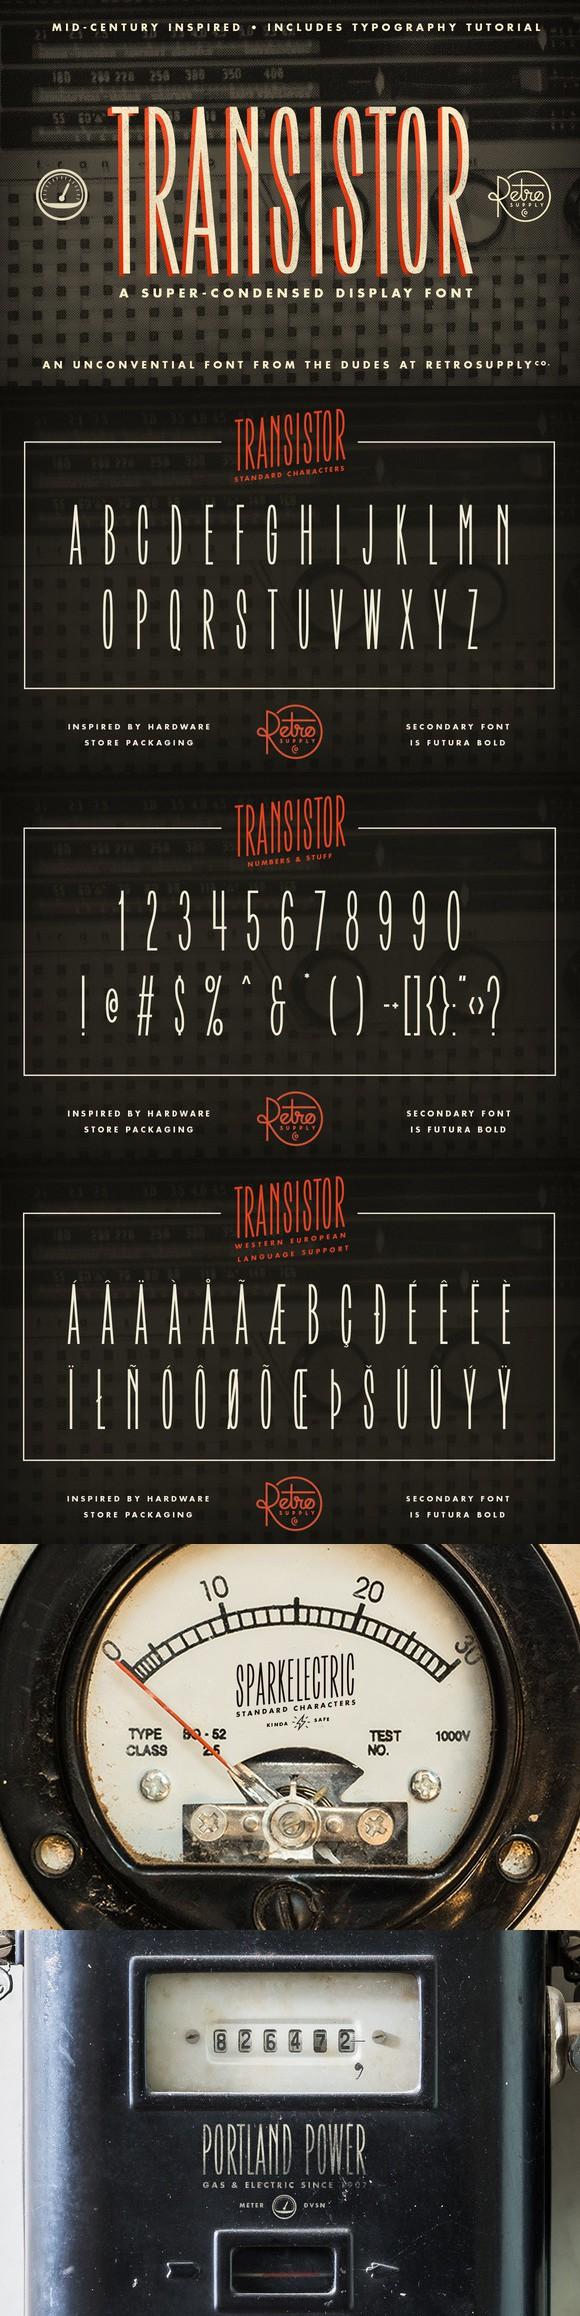 Transistor Font | FREE Download. Display Fonts. $10.00